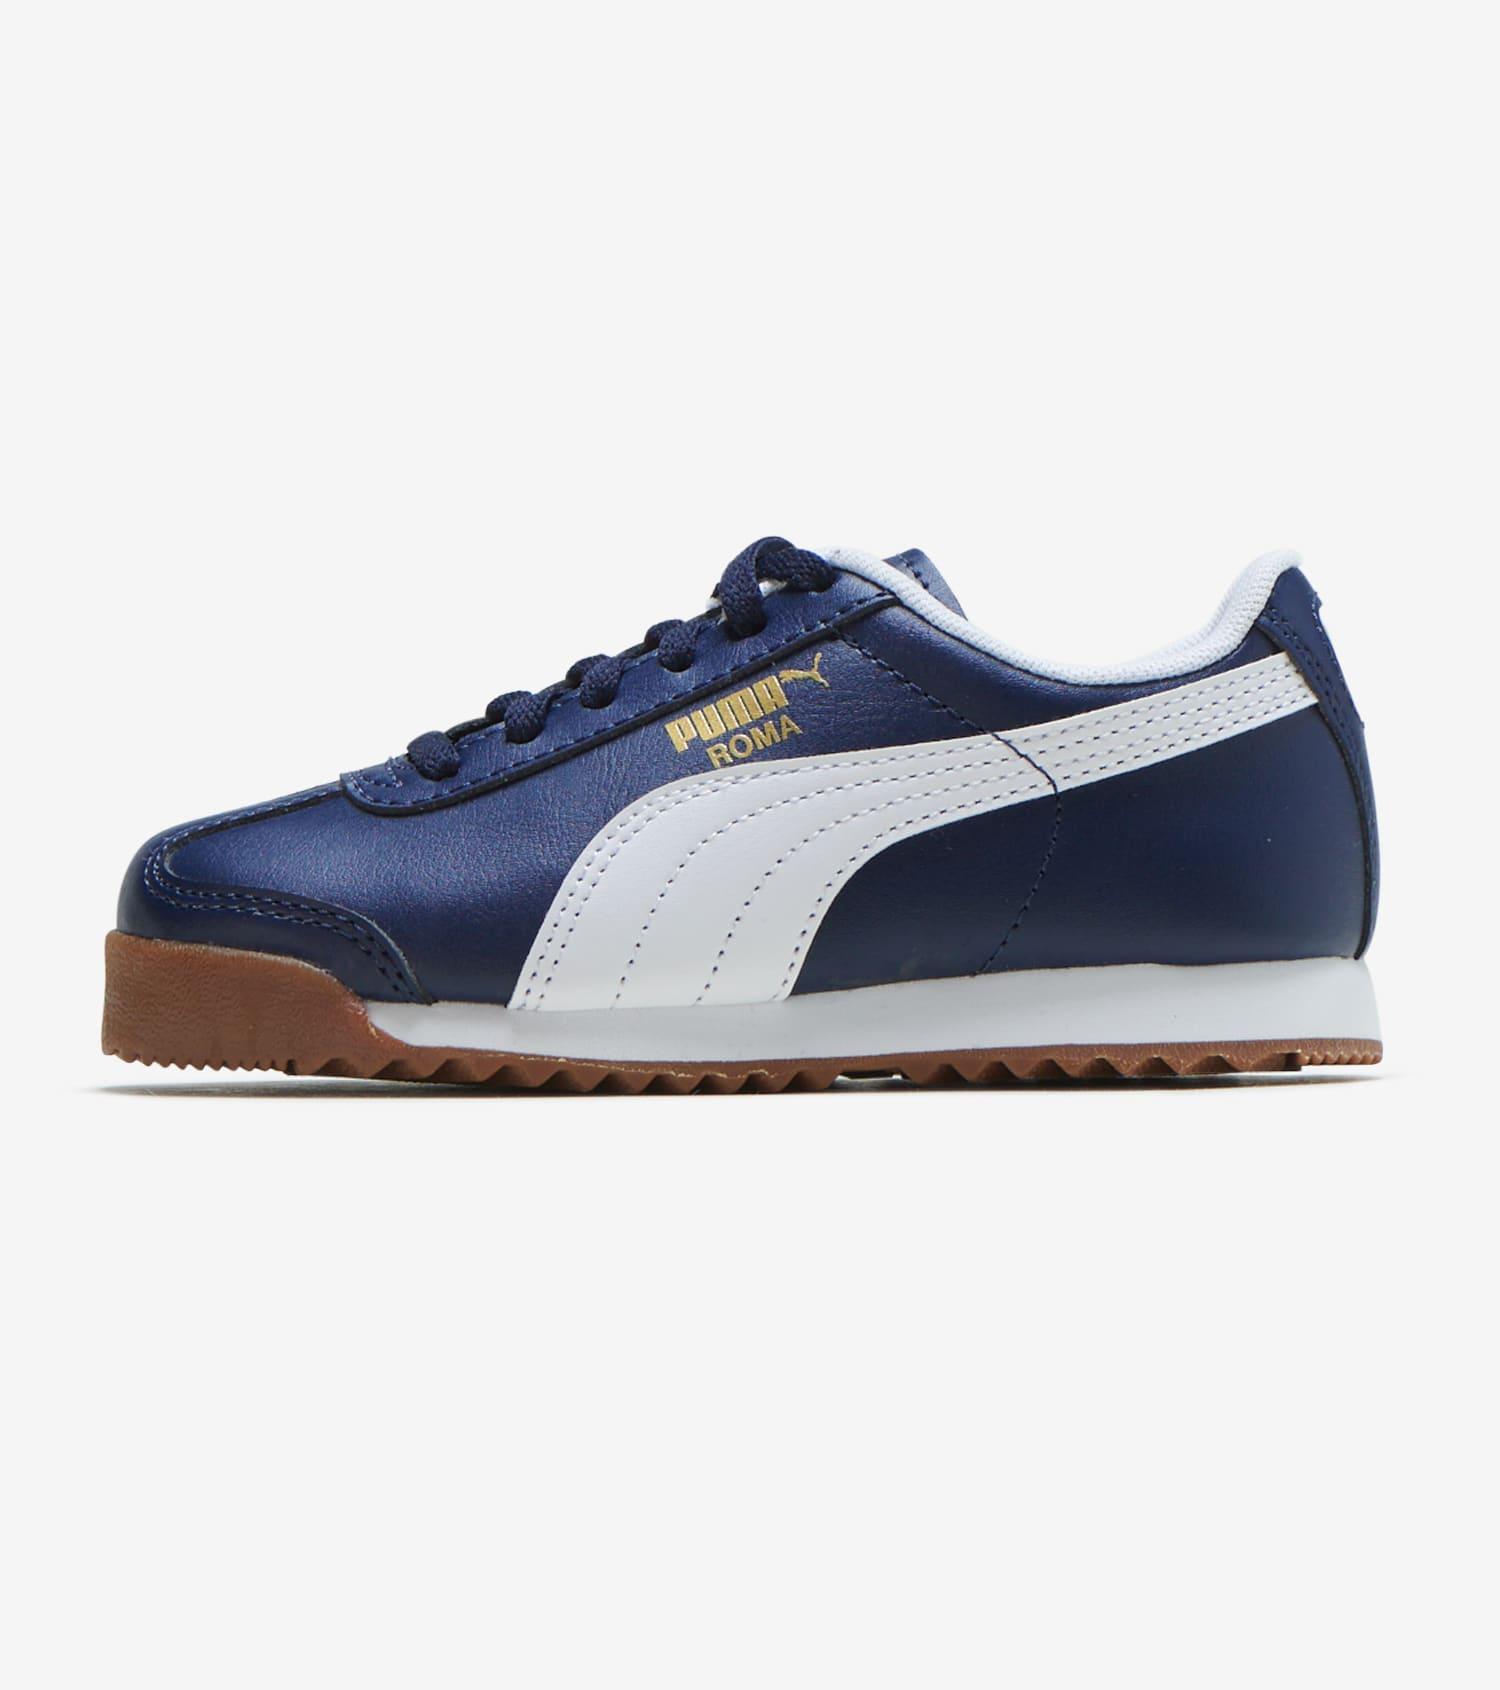 Billige Puma Schuhe Puma Roma Basic Navy Gold Schwarz